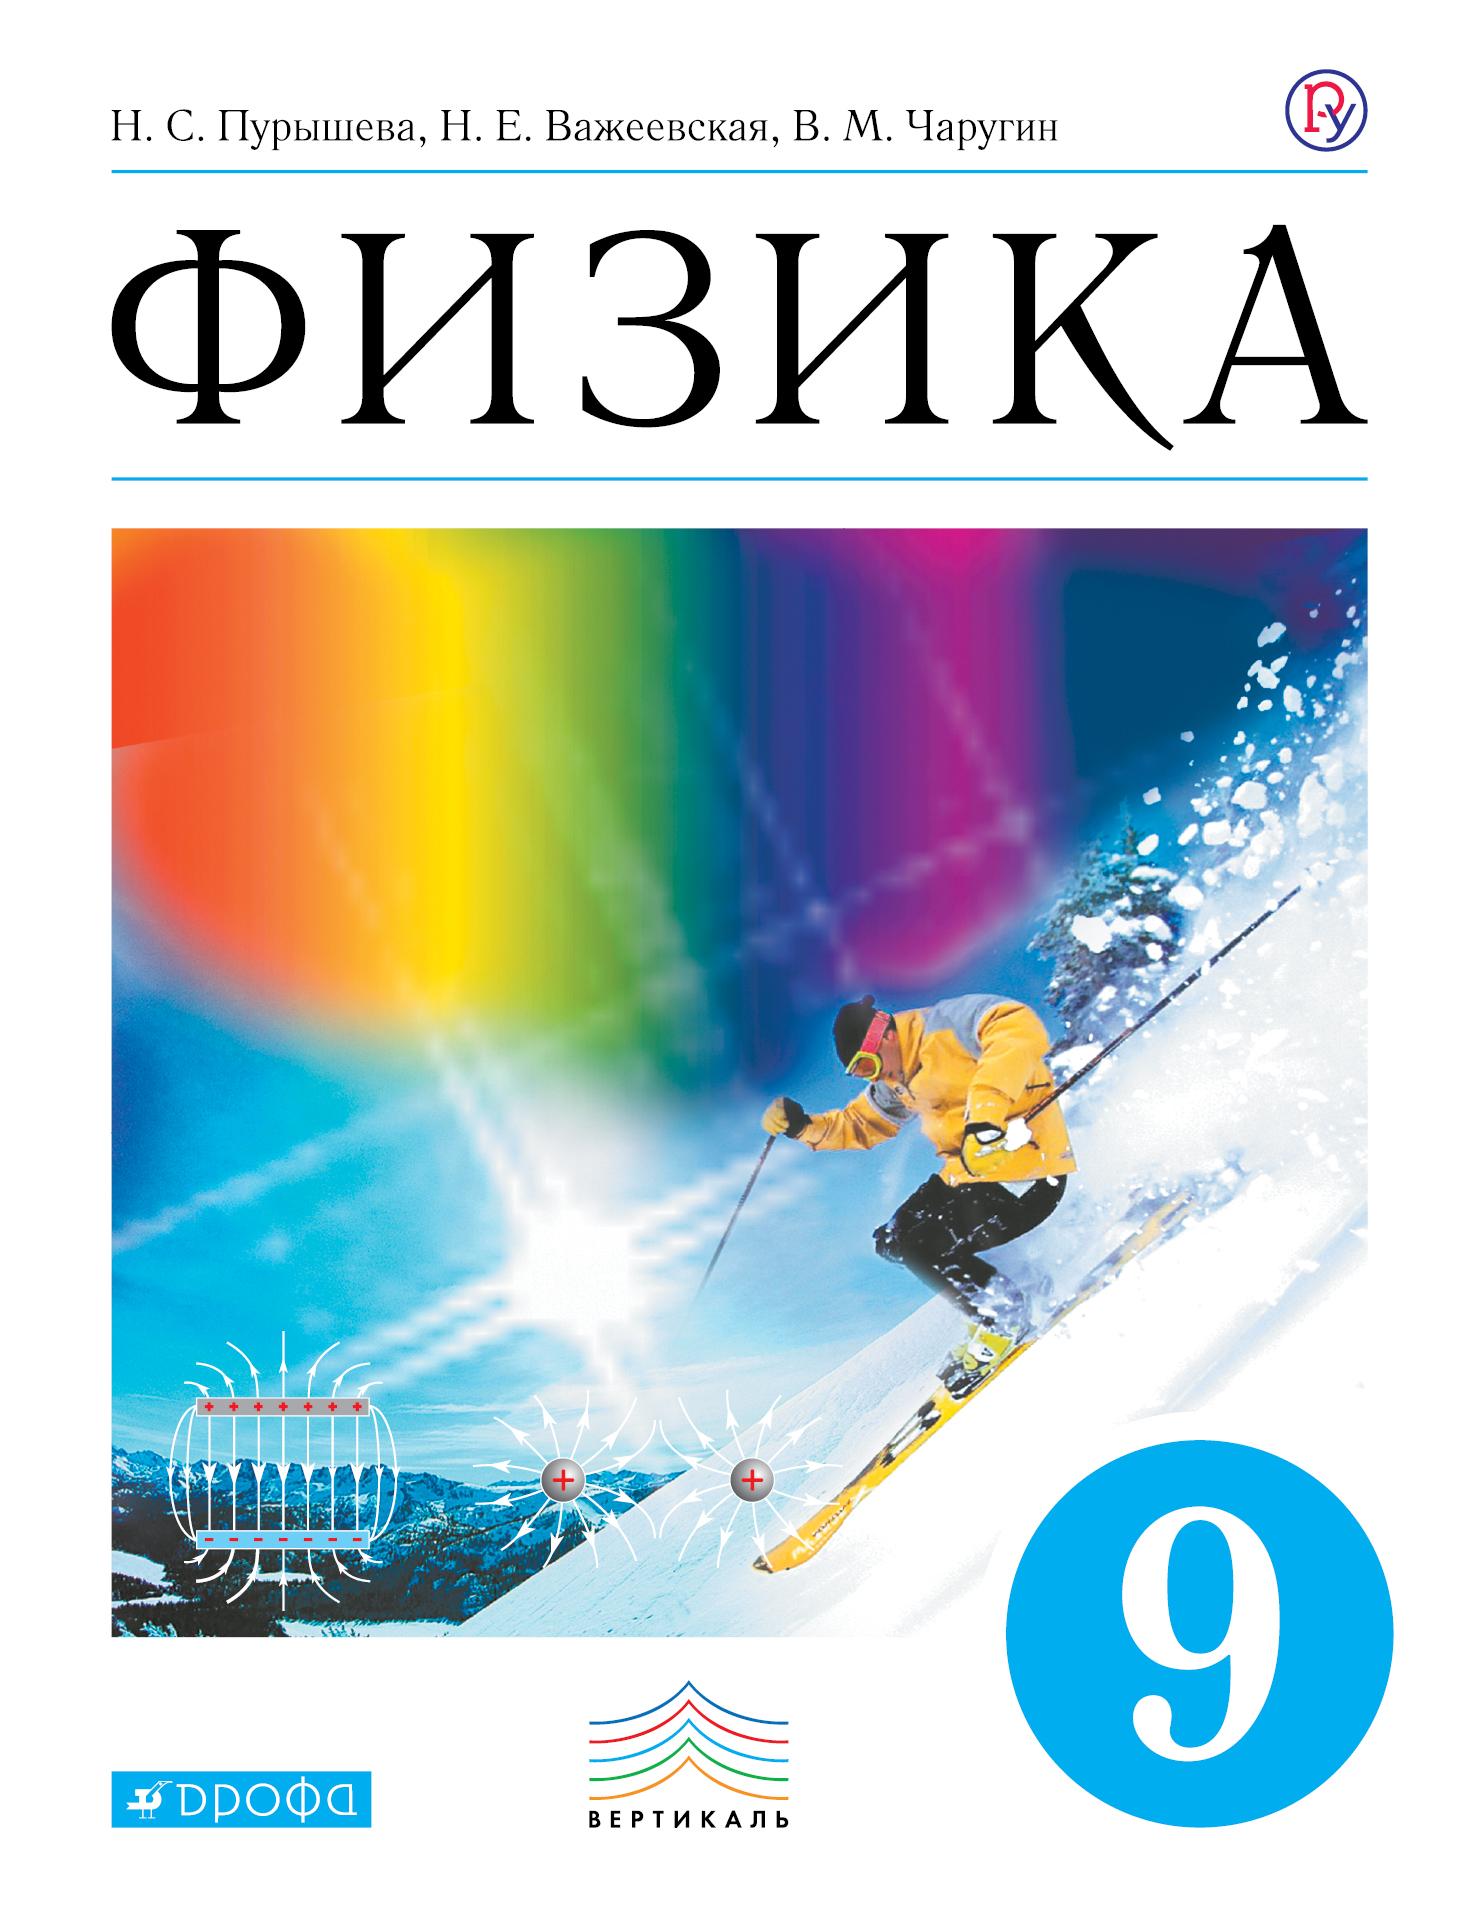 Пурышева Н.С., Важеевская Н.Е. Физика. 9 класс. Учебник.